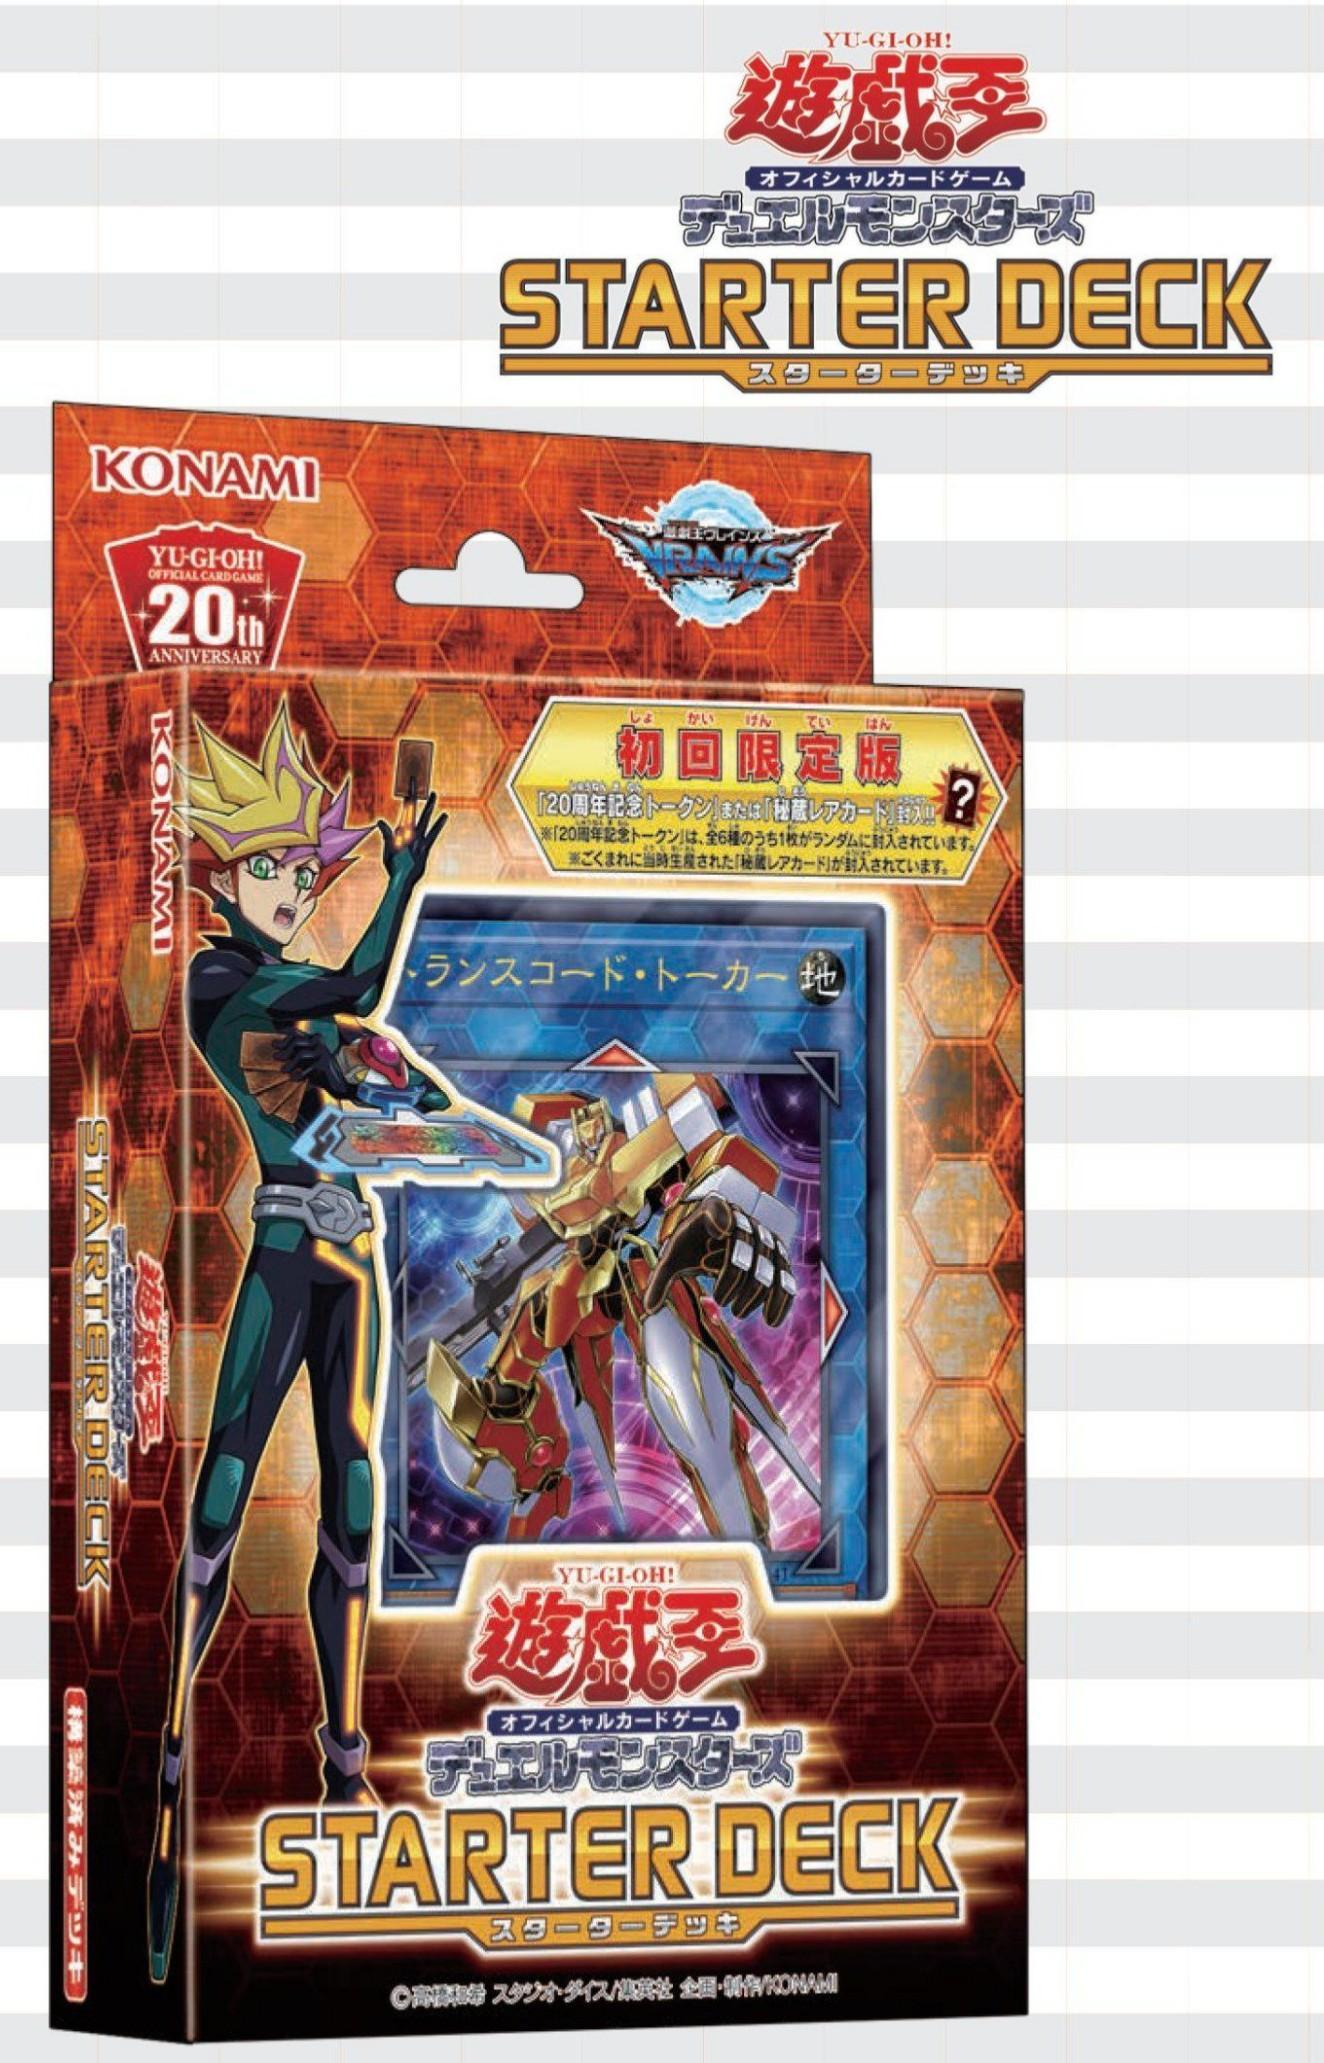 Starter deck yugi release date